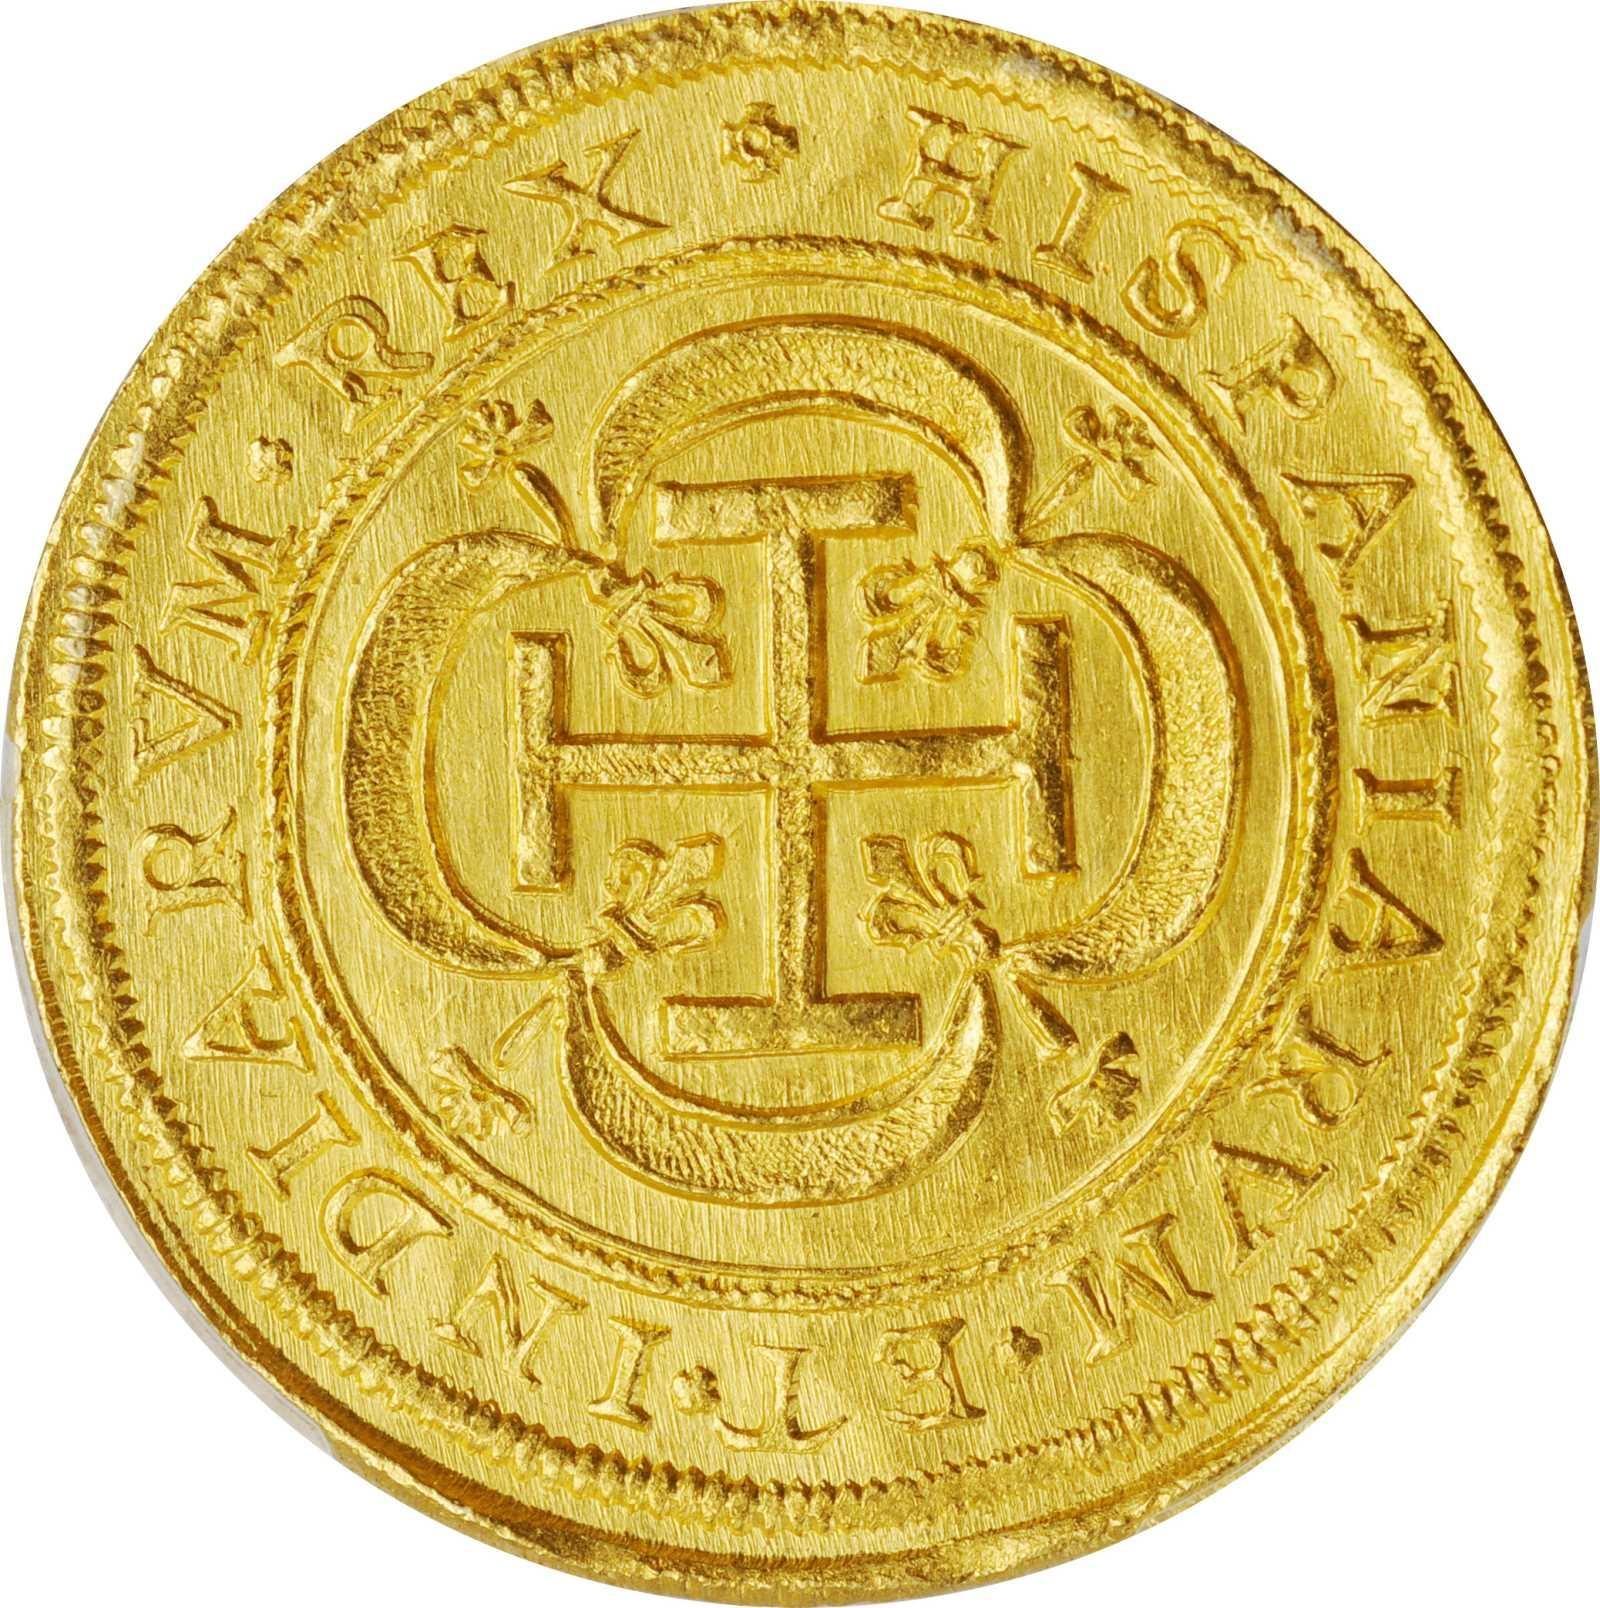 8-escudos-redondo.-mjico-1714.-rematado-en-312.000